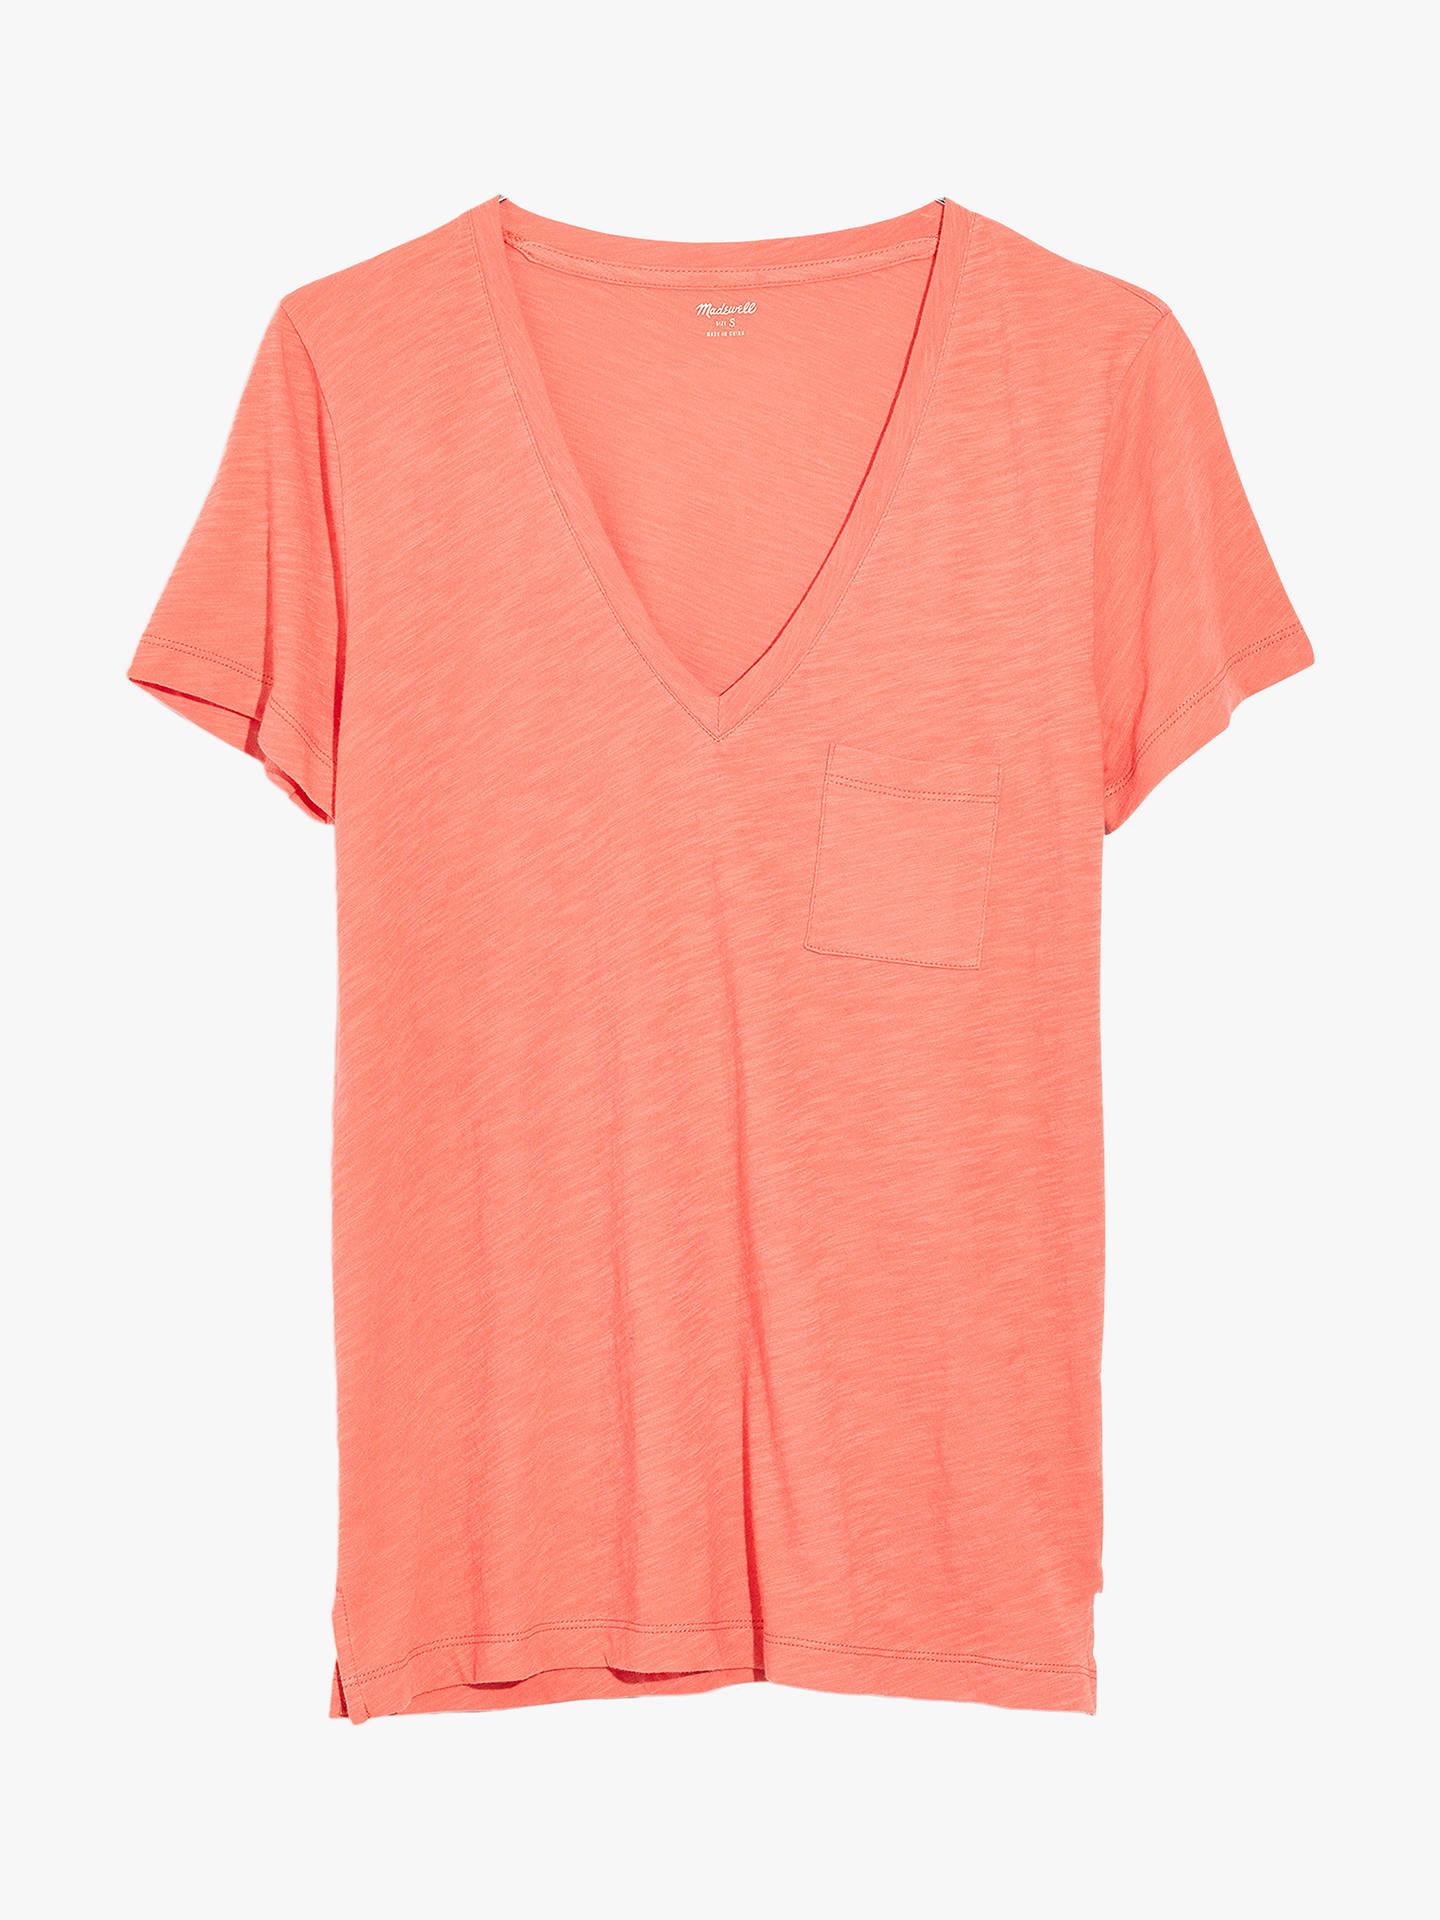 83e9d798 Madewell Whisper Cotton V-Neck Pocket T-Shirt, Dried Coral at John ...